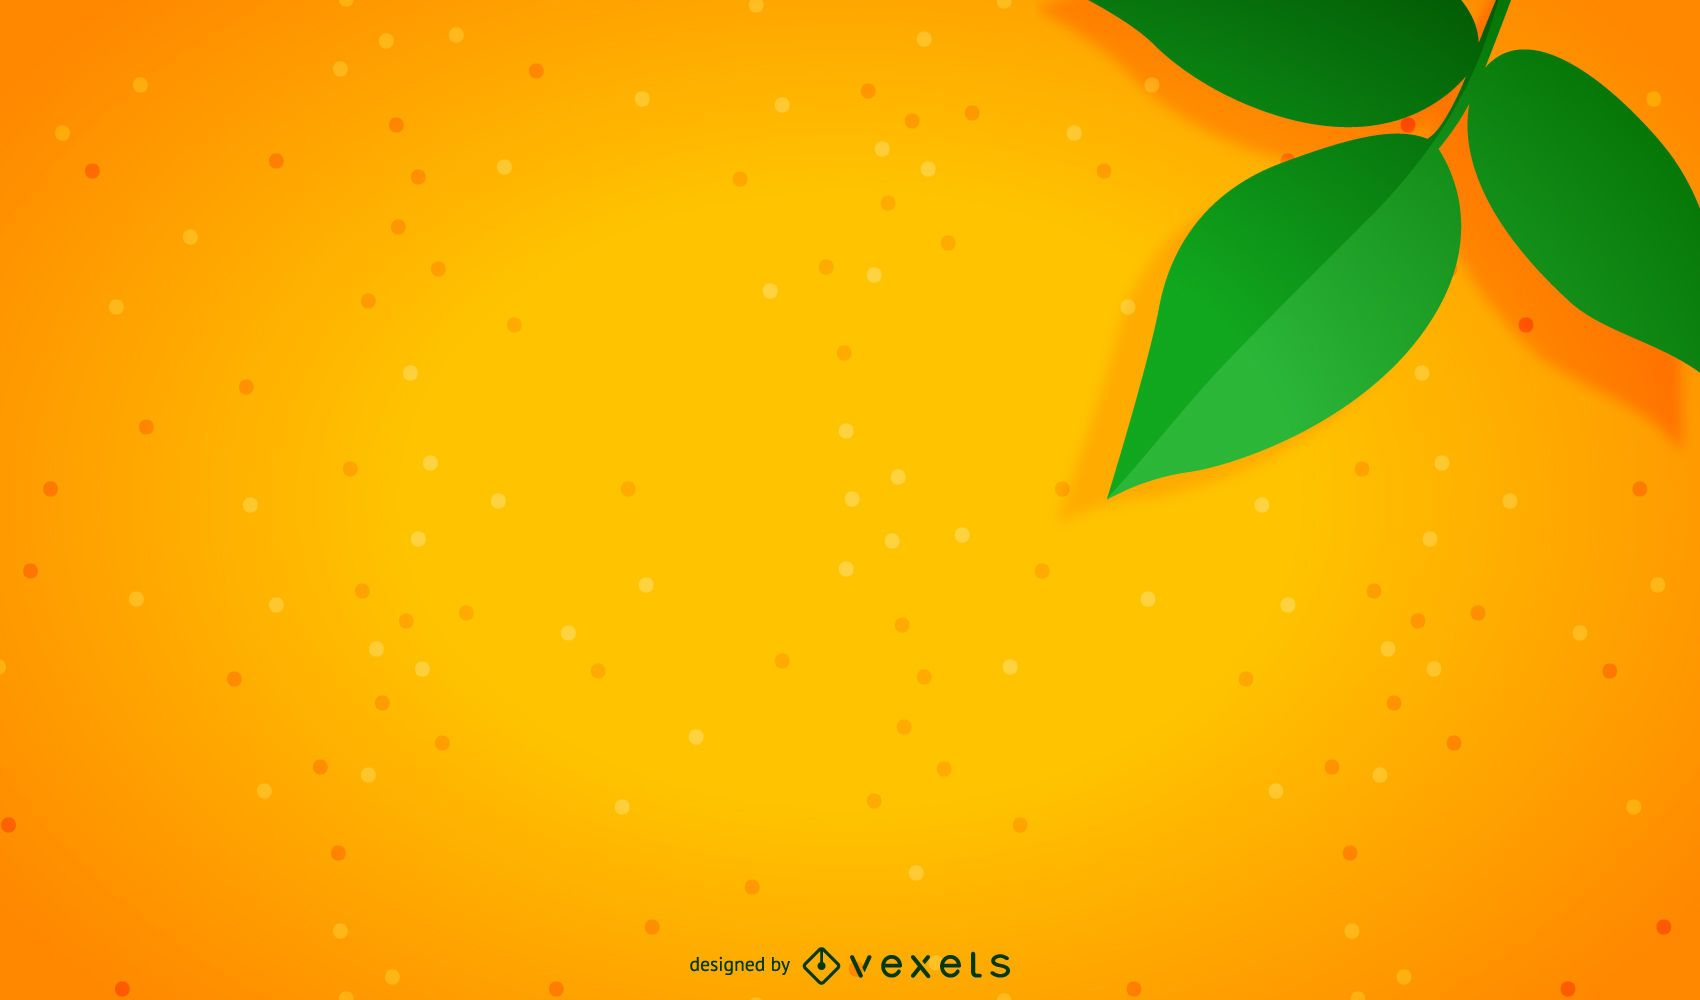 Cute Cartoon Flower Wallpaper Minimalist Orange Background Vector Download